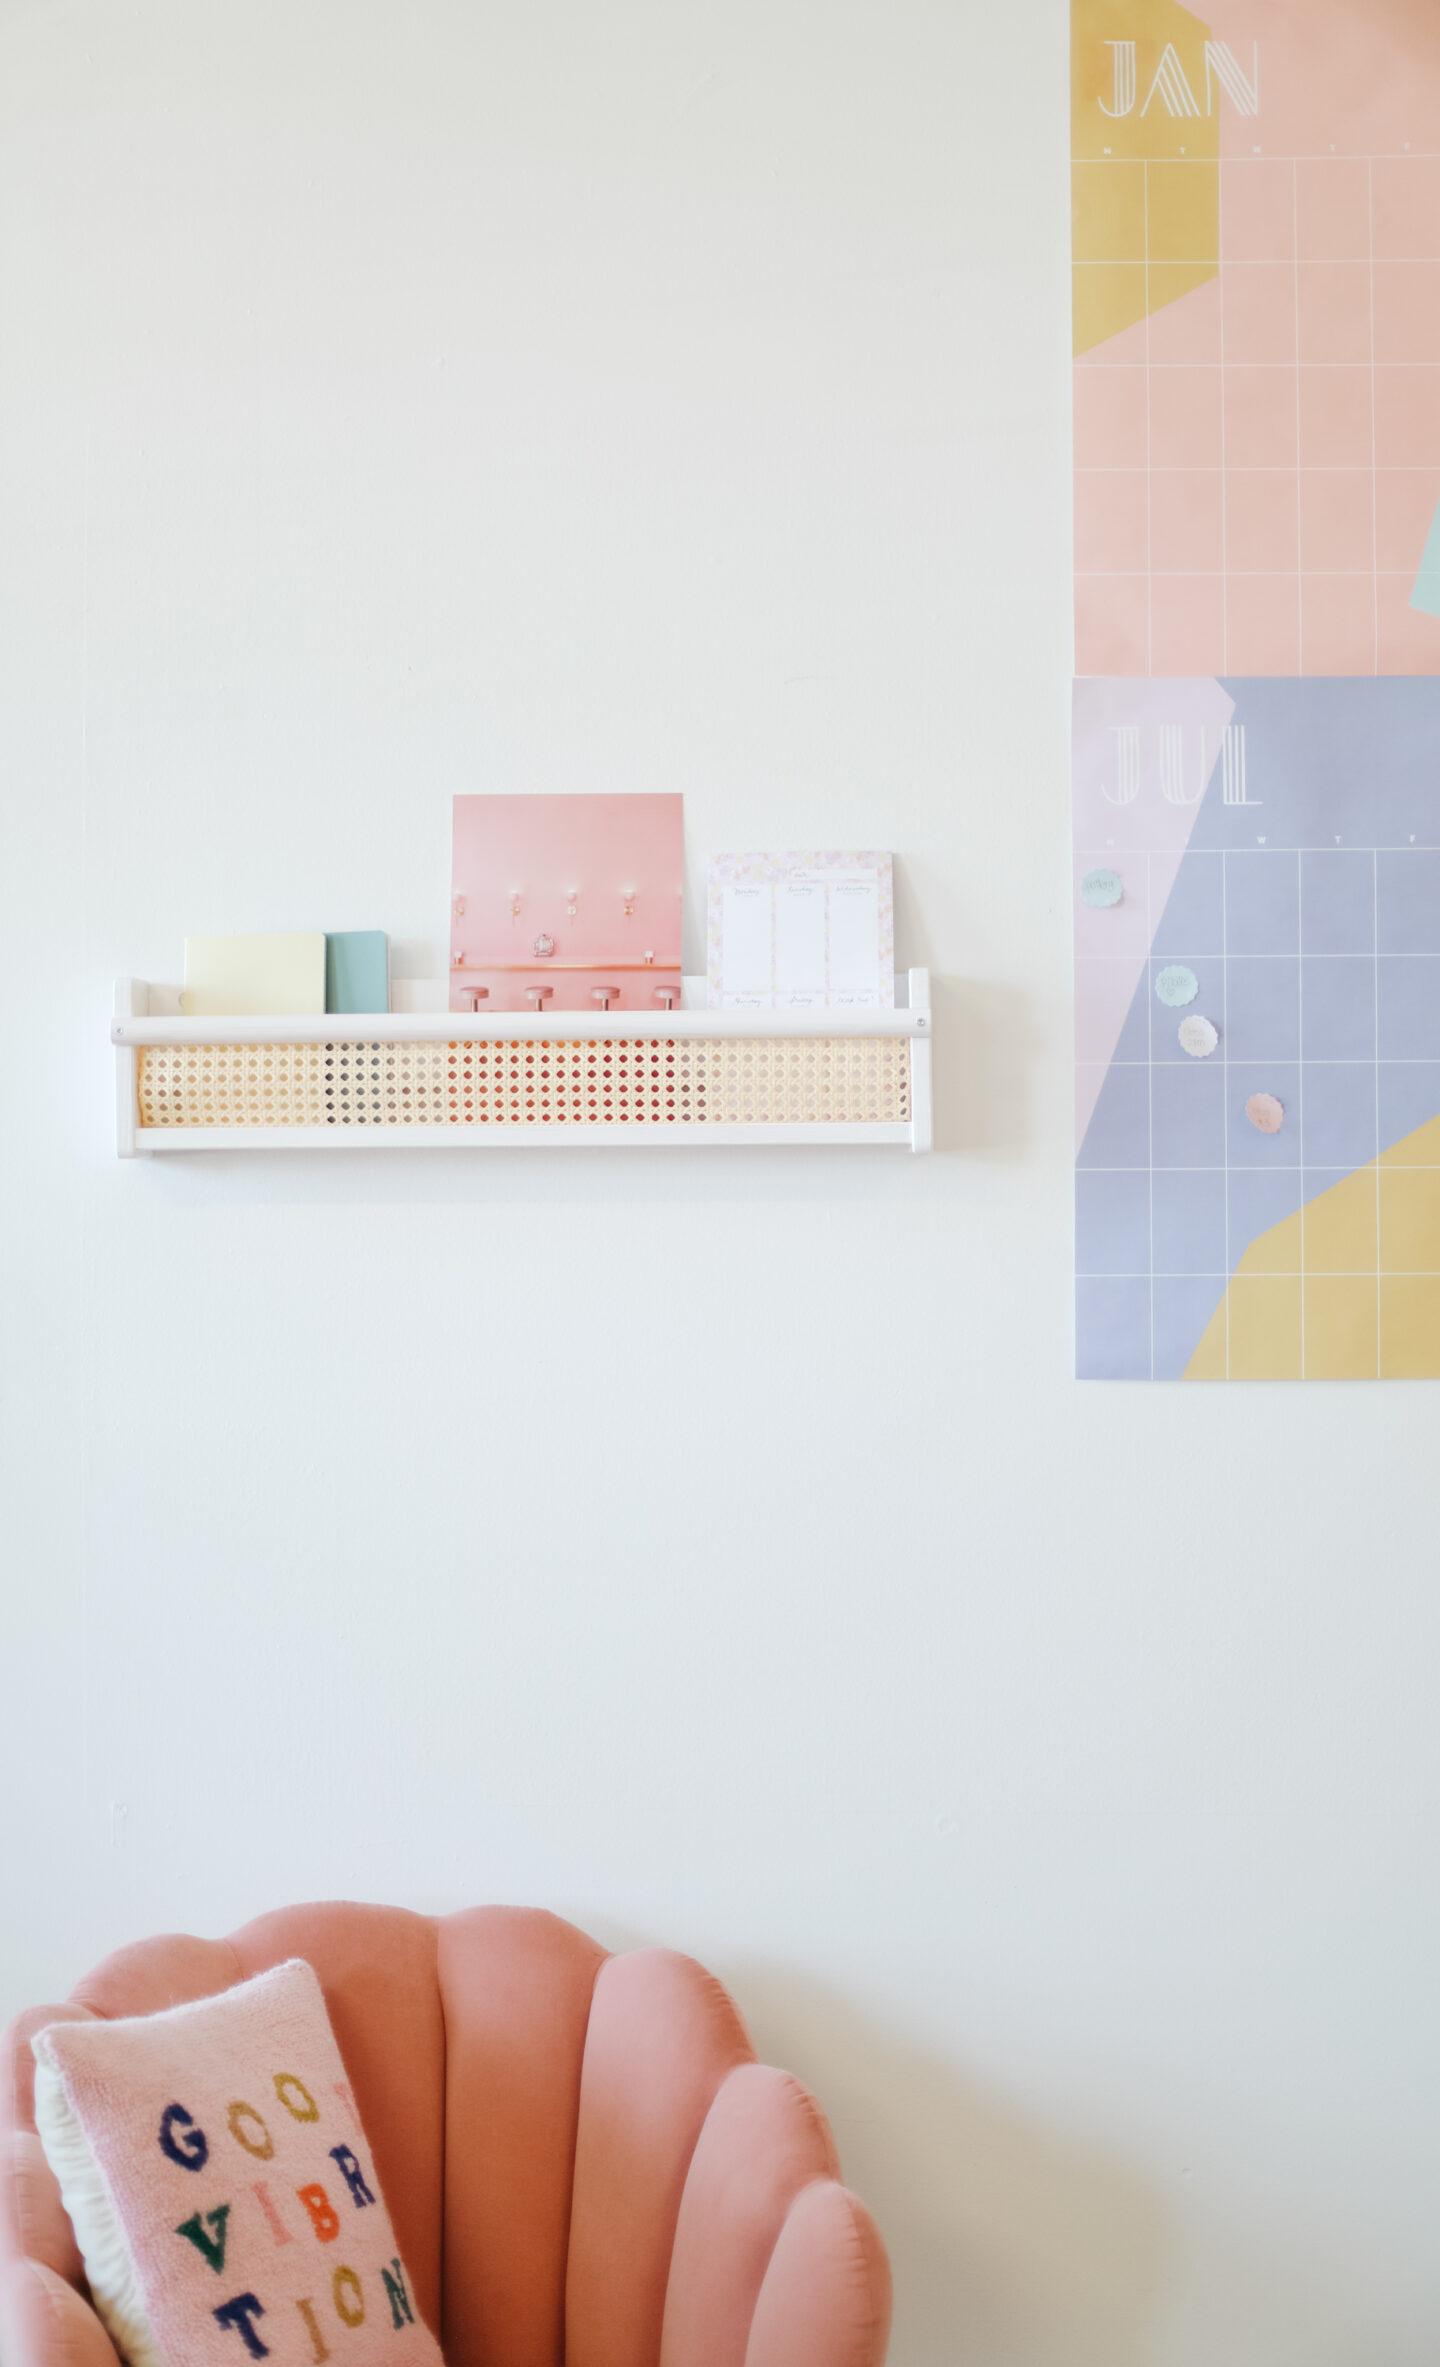 Cane shelf from an old IKEA shelf DIY